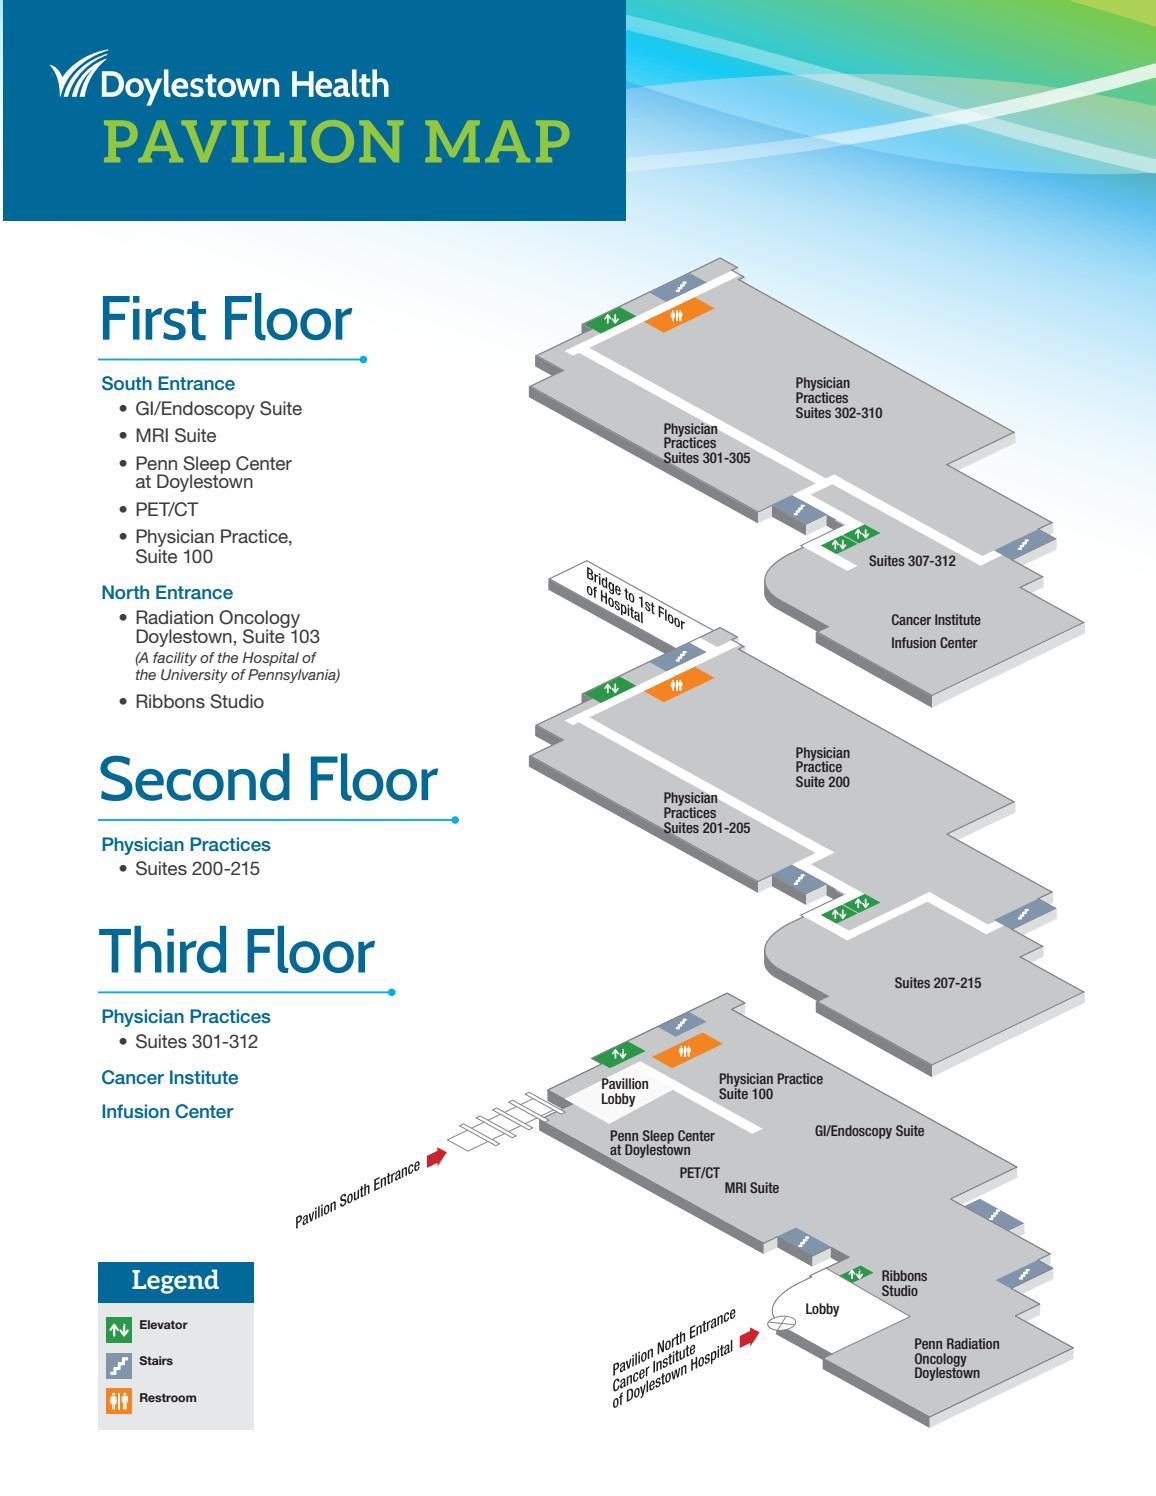 Endoscopy Suite: Pavilion Floor Plans By Doylestown Health